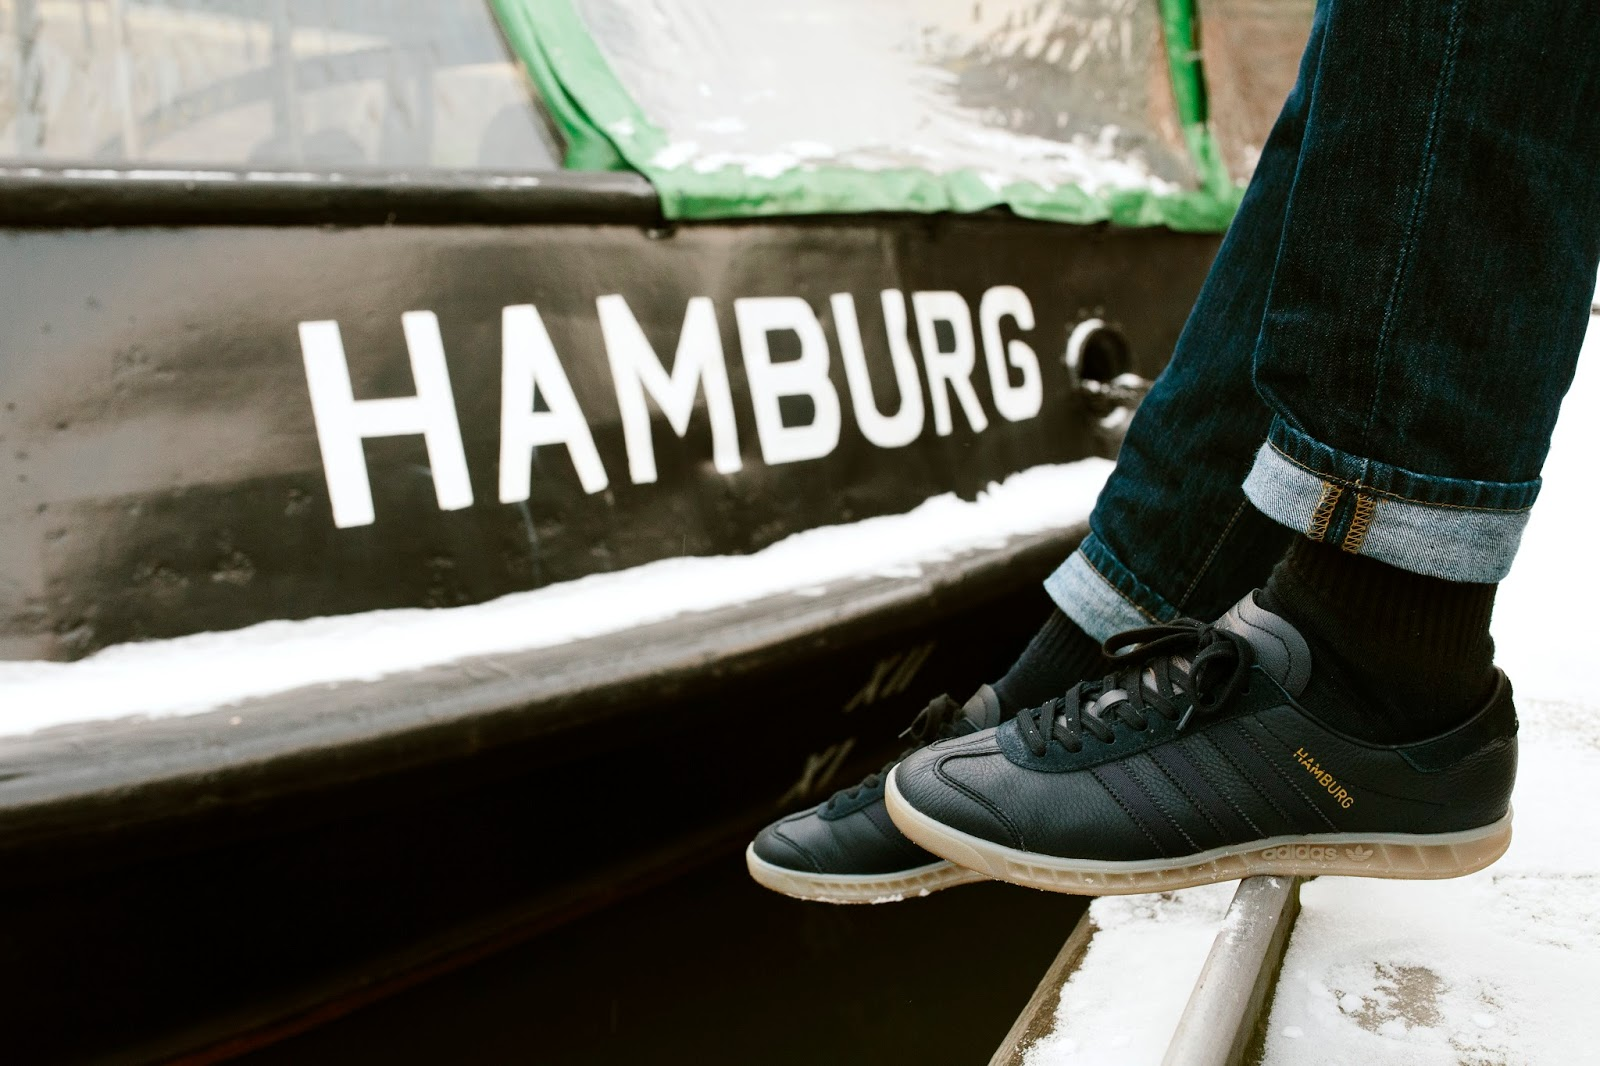 brand new 6e9f5 13633 Buckets   Spades - Men s Fashion, Design and Lifestyle Blog  adidas ...